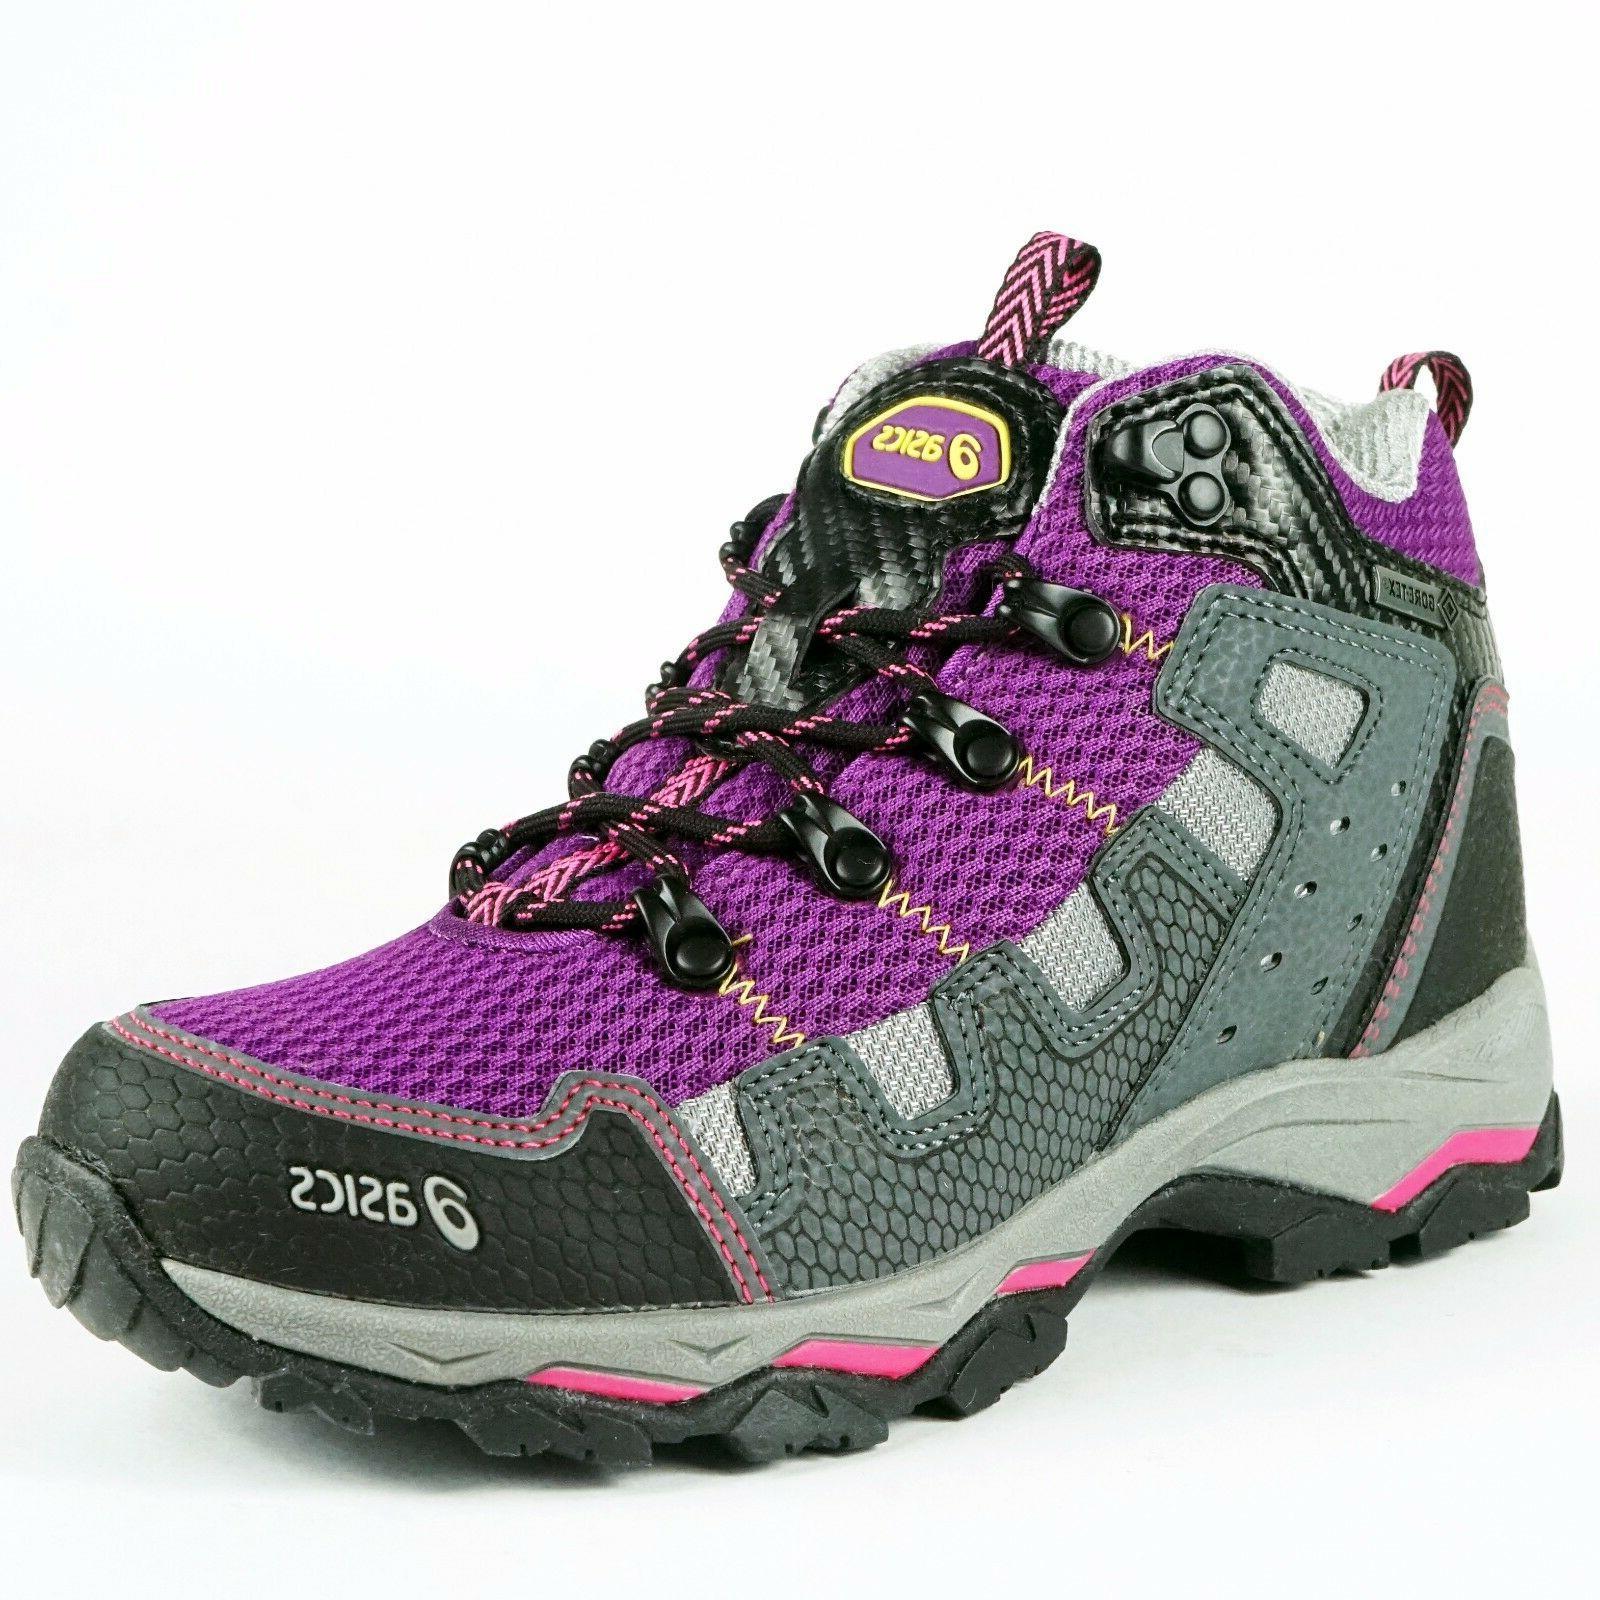 Asics GEL-MONTALTO Mid Sports Hiking